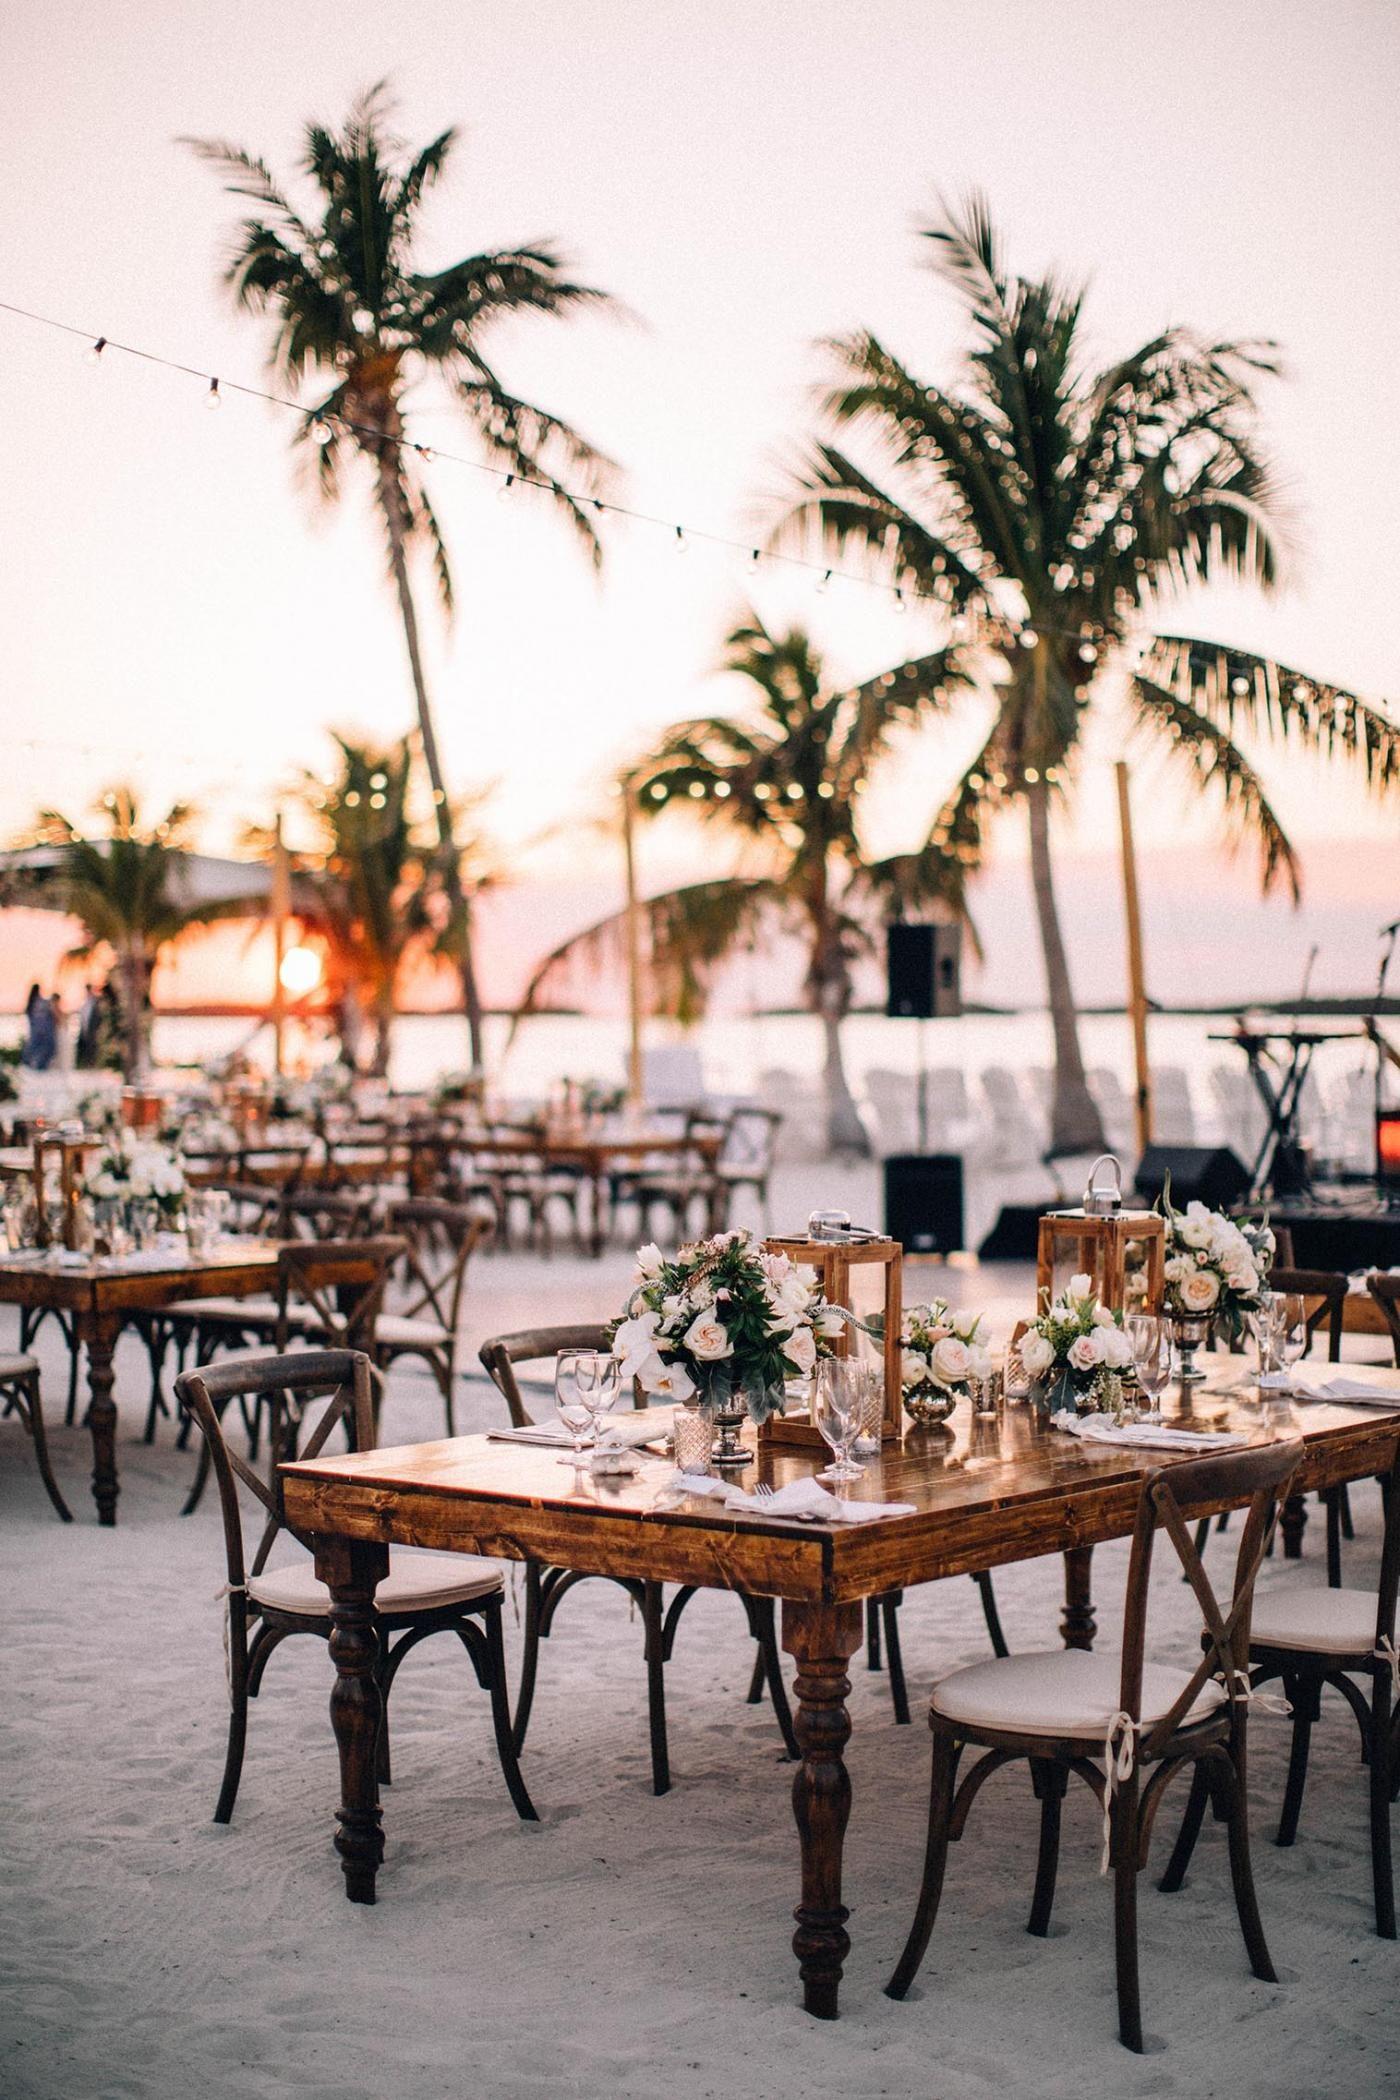 An Islamorada Wedding That's Got Us Ready to Escape to the Tropics